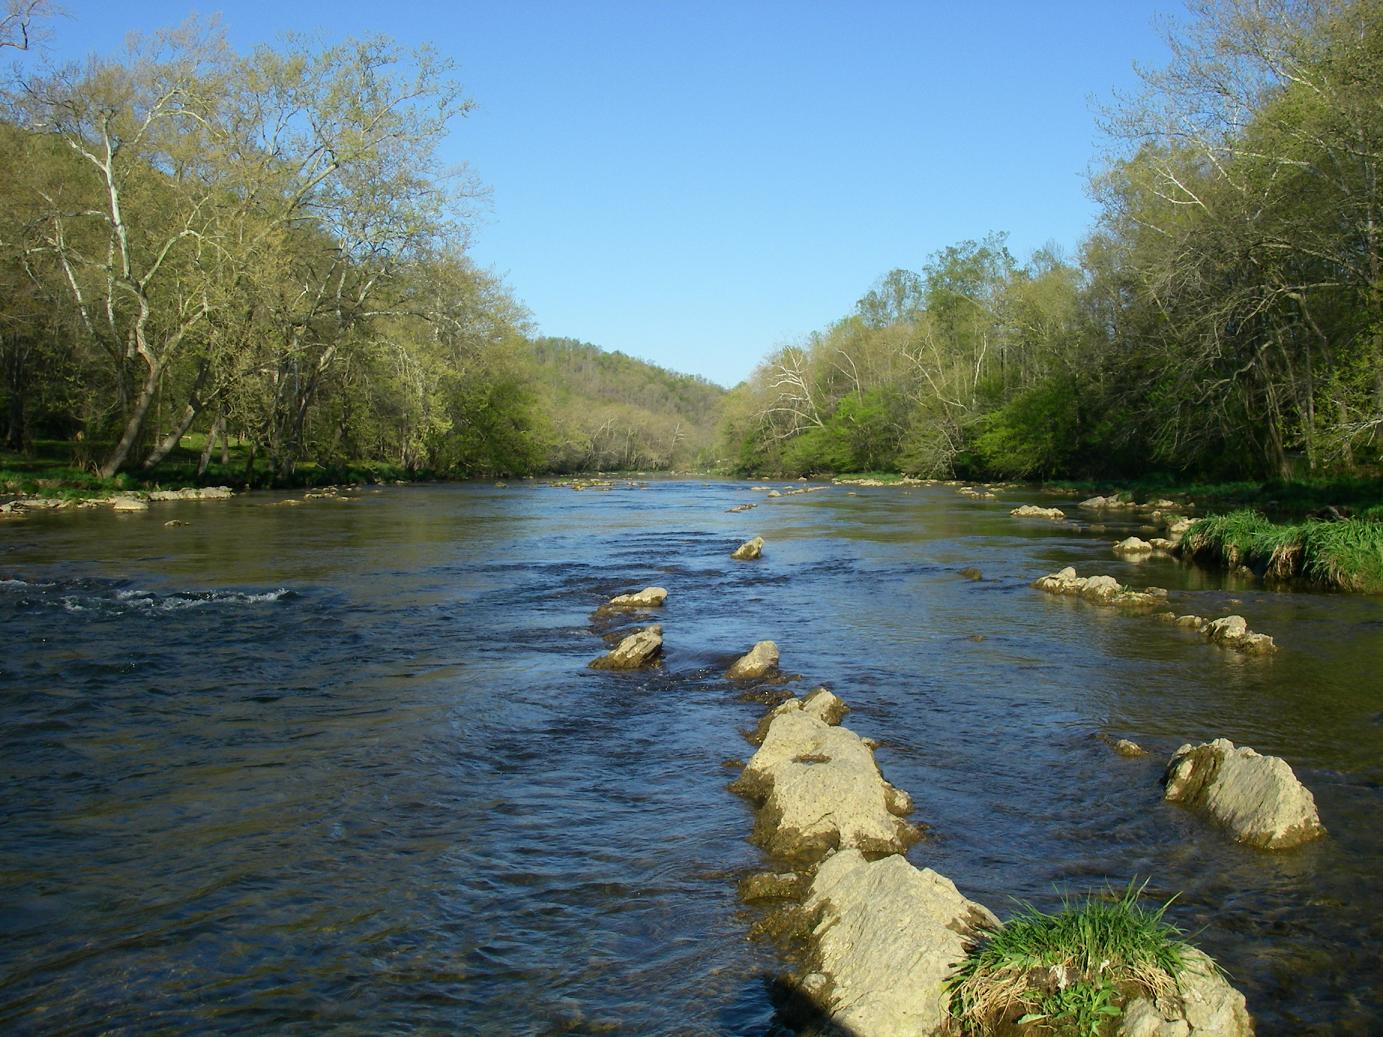 South Holston River